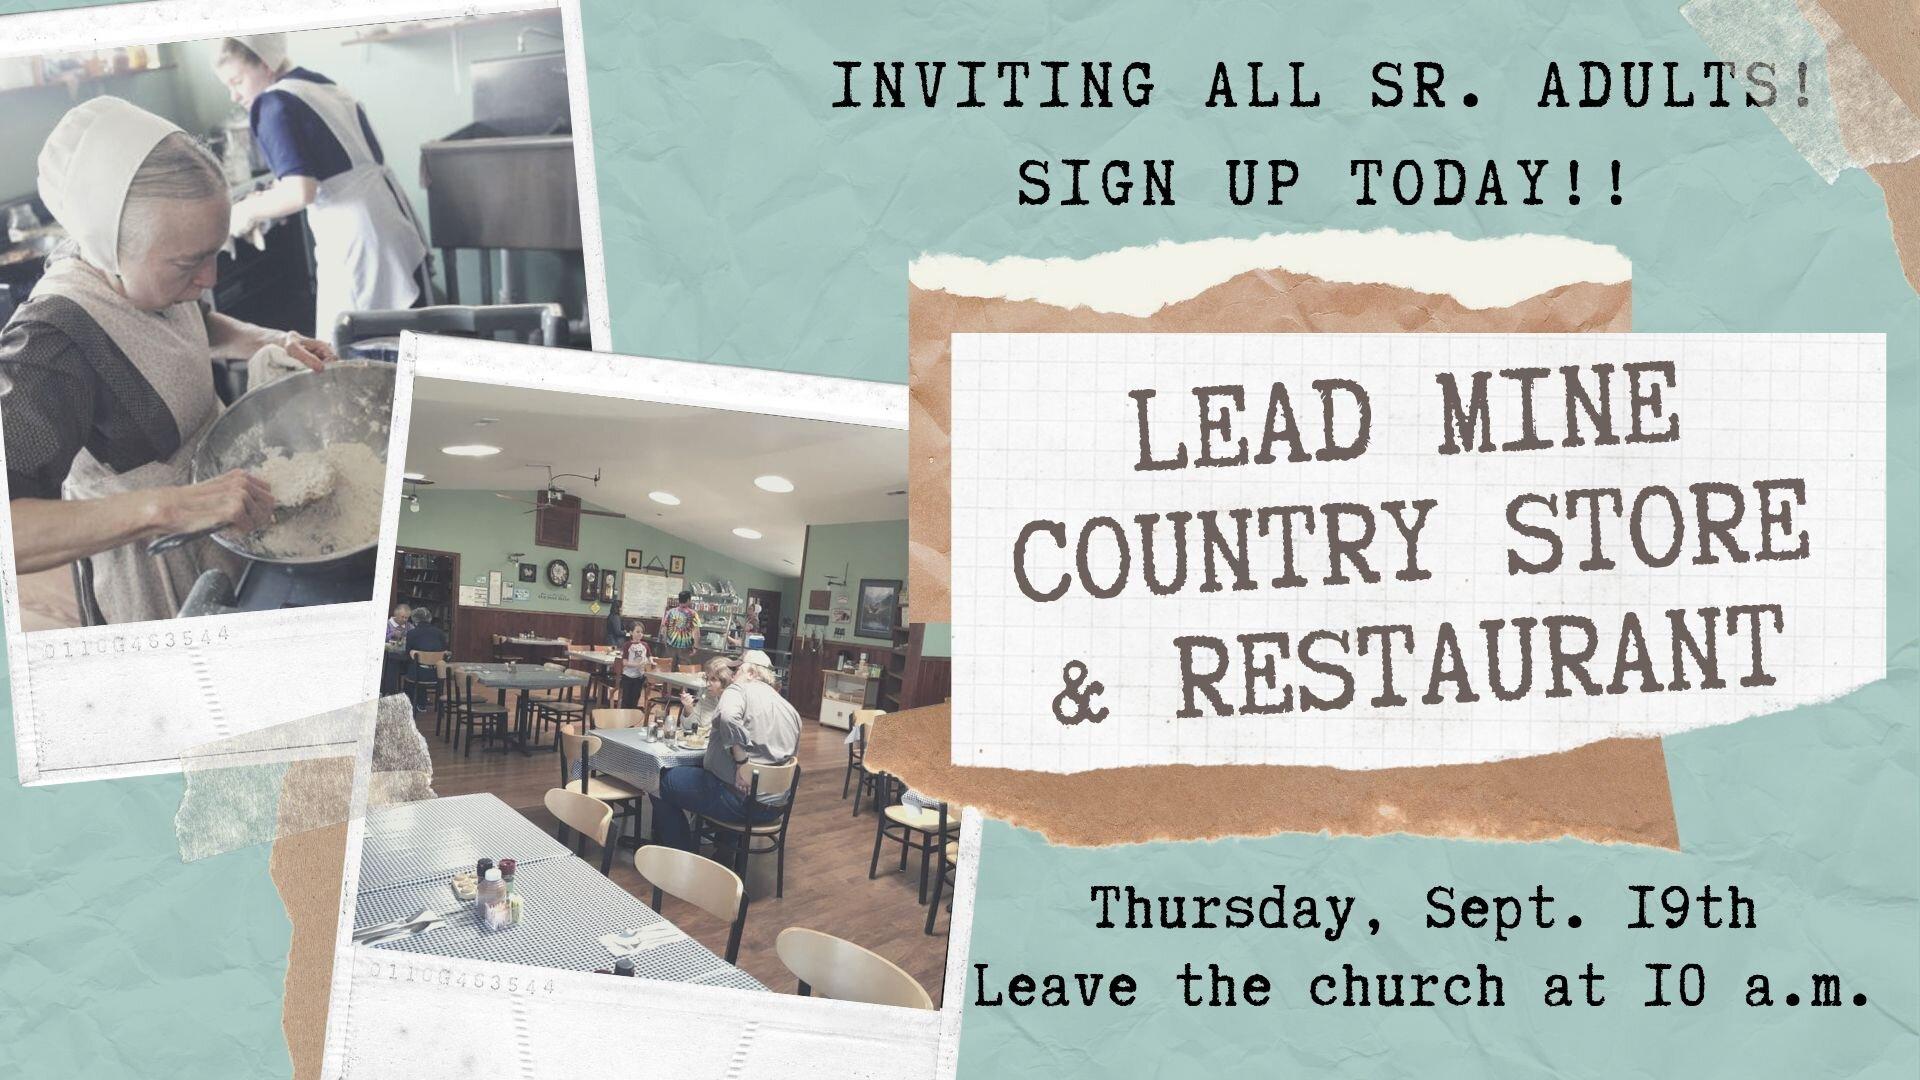 Lead Mine Country Store.jpg